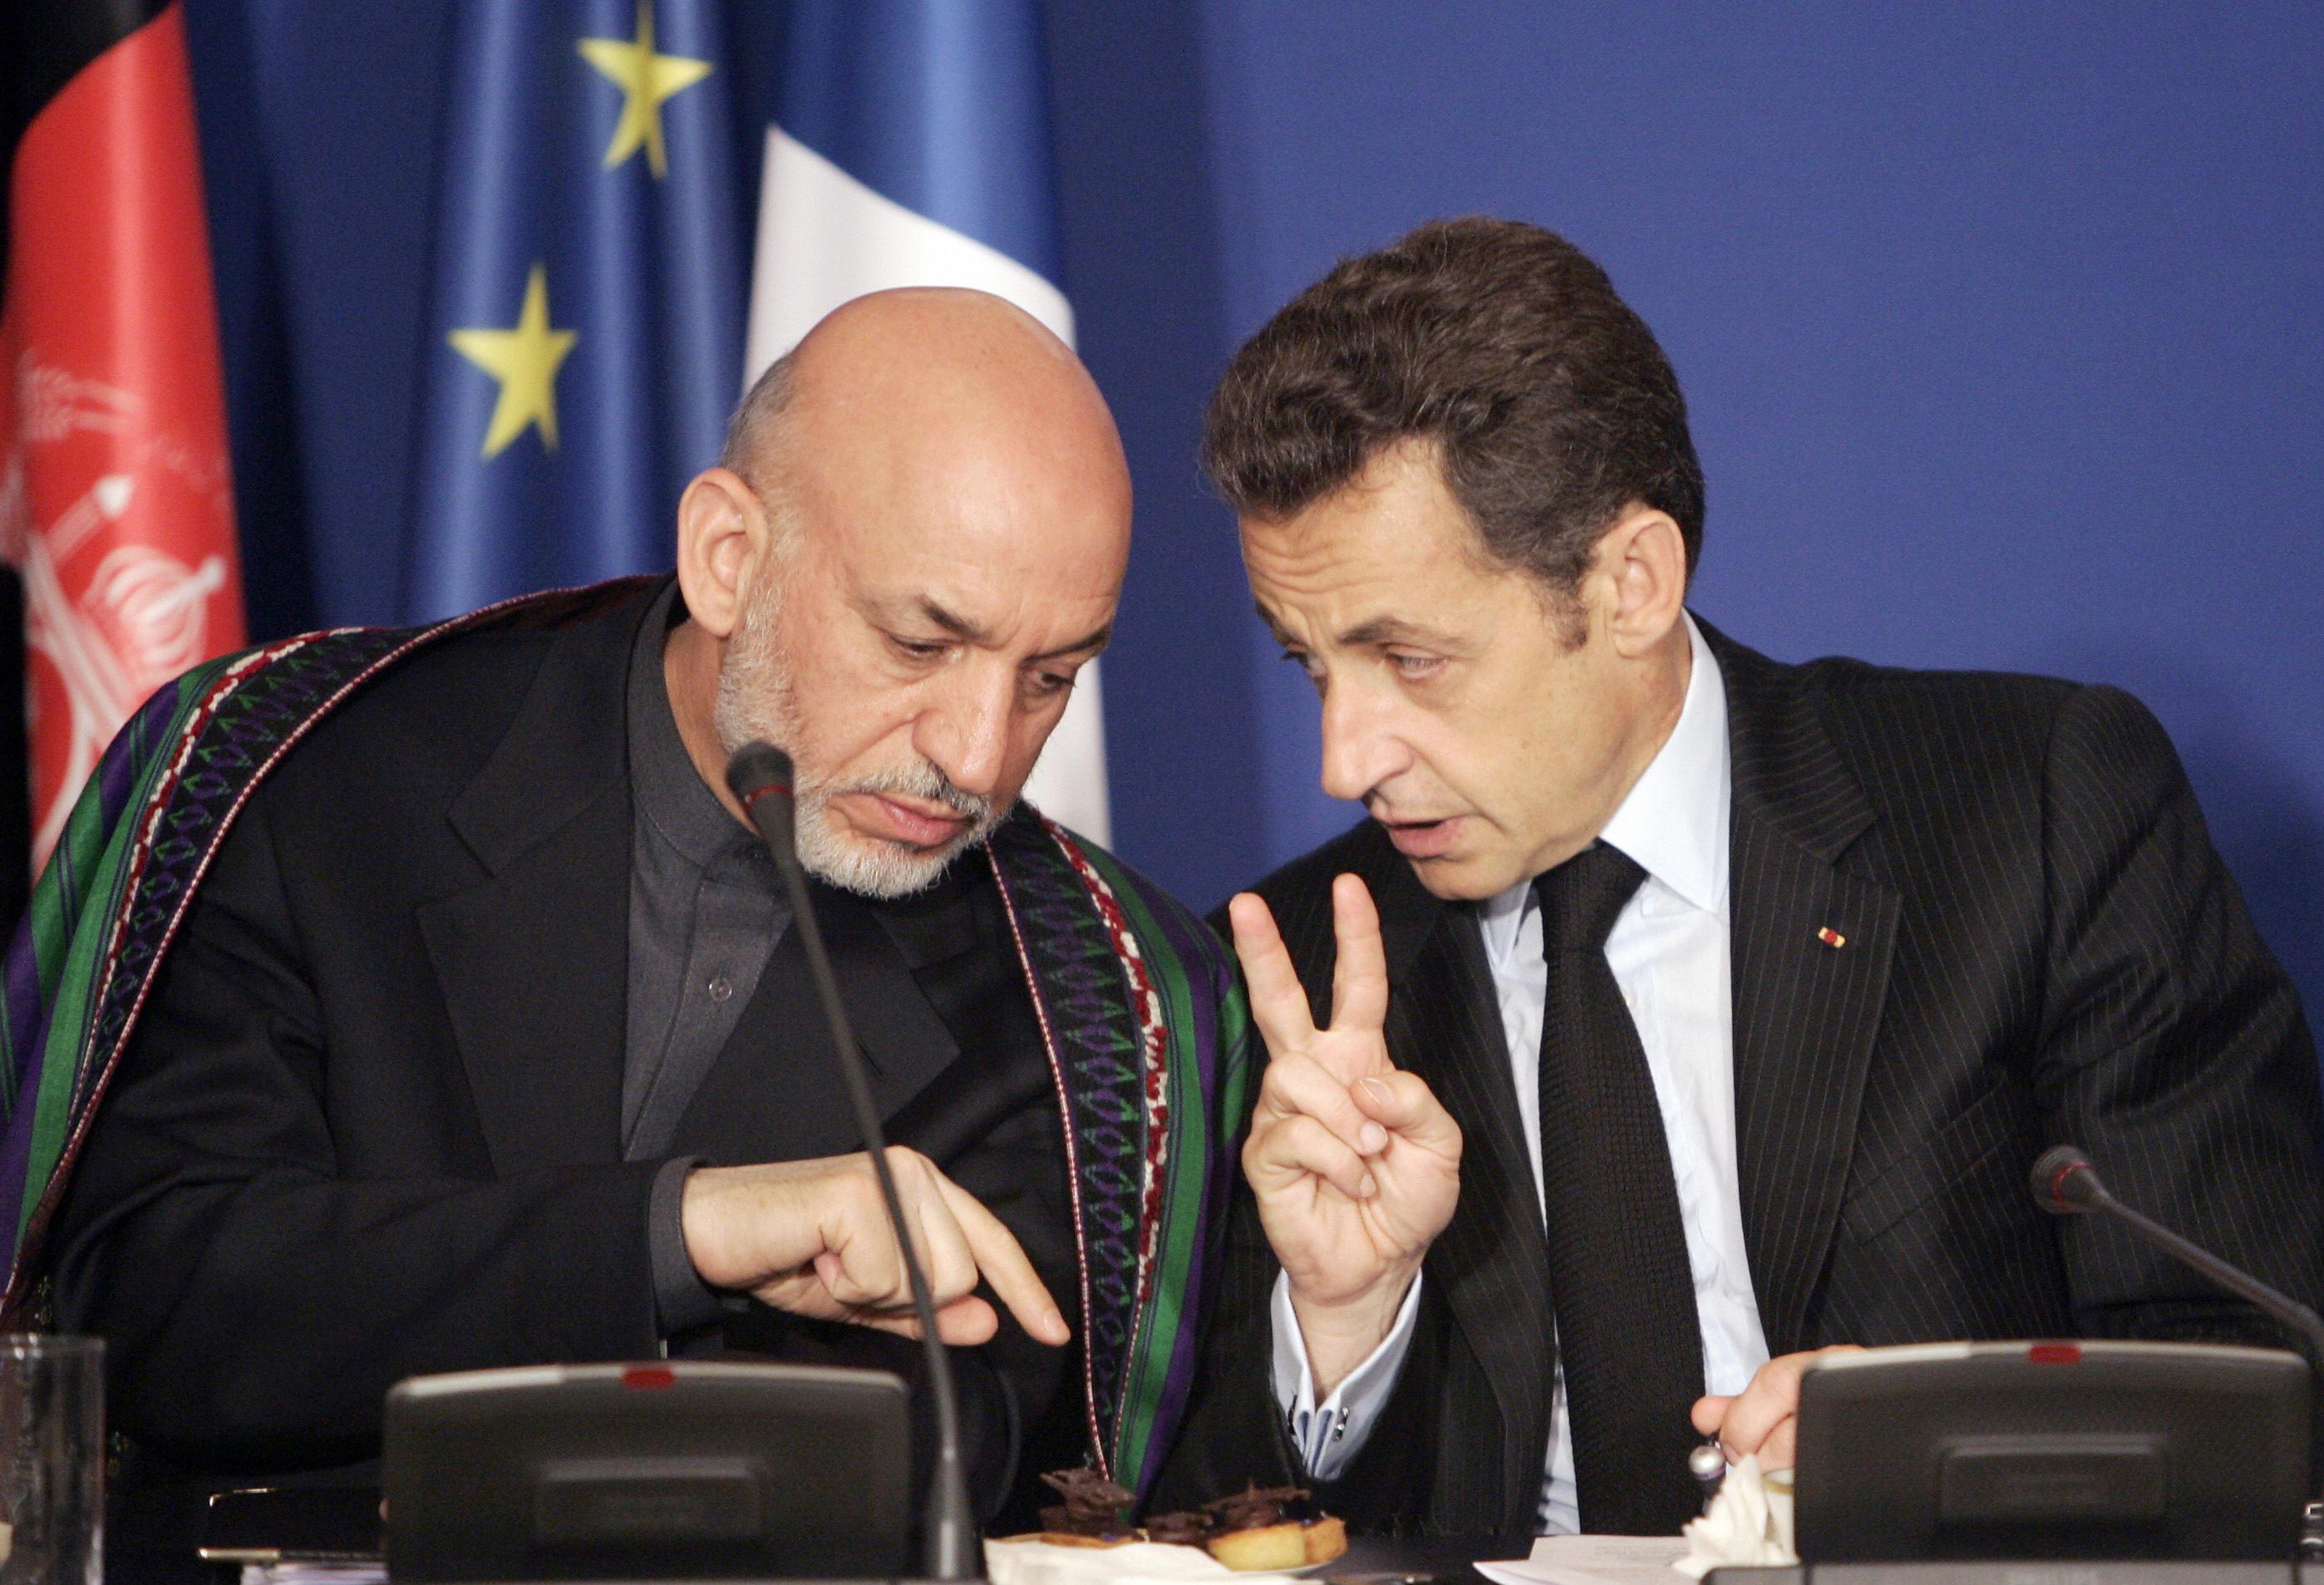 French President Nicolas Sarkozy  chats with Afghan President Hamid Karzai.